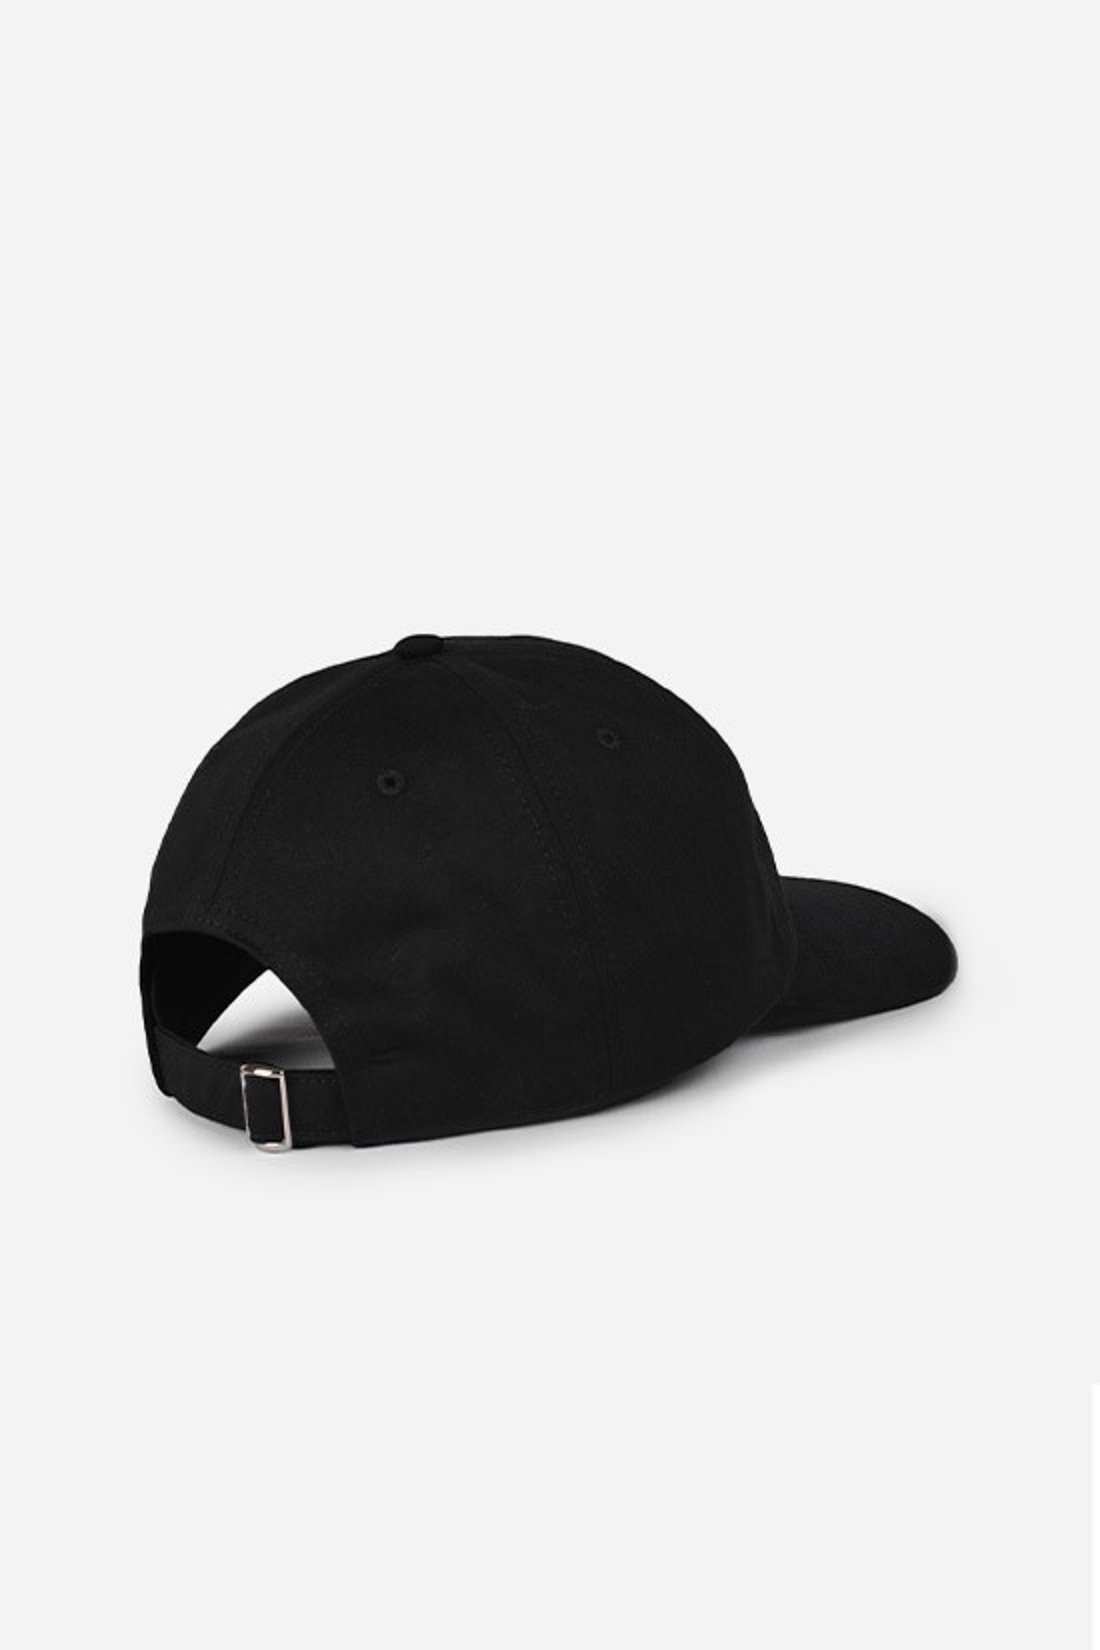 RAVE / R logo cap Black